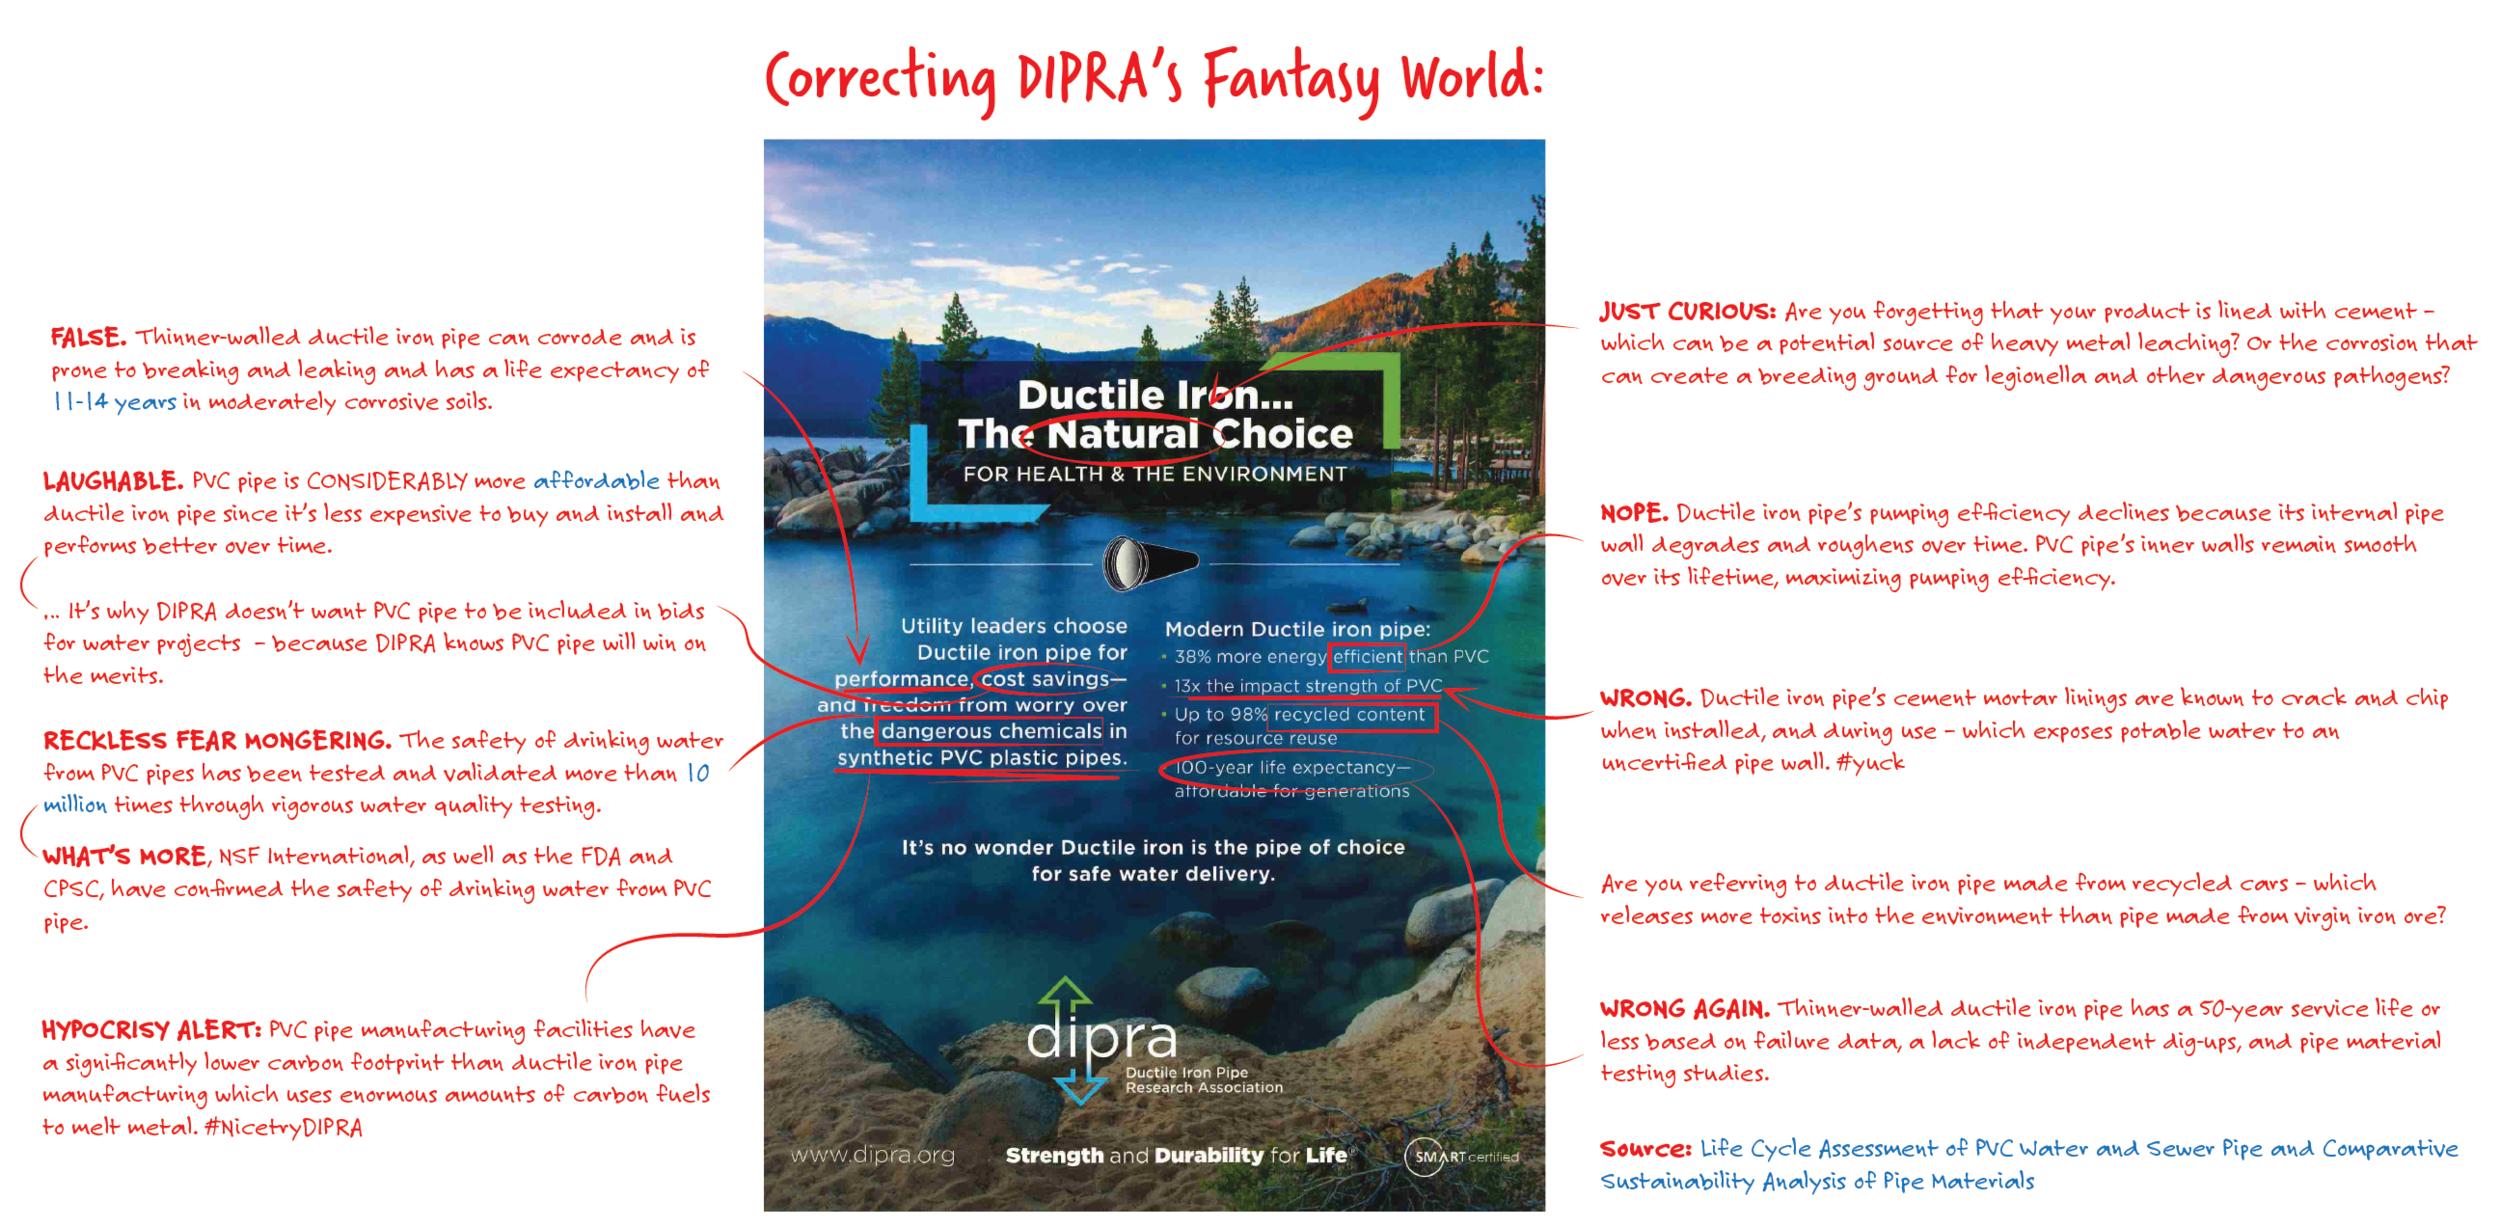 Correcting Dipras Fantasy World.png